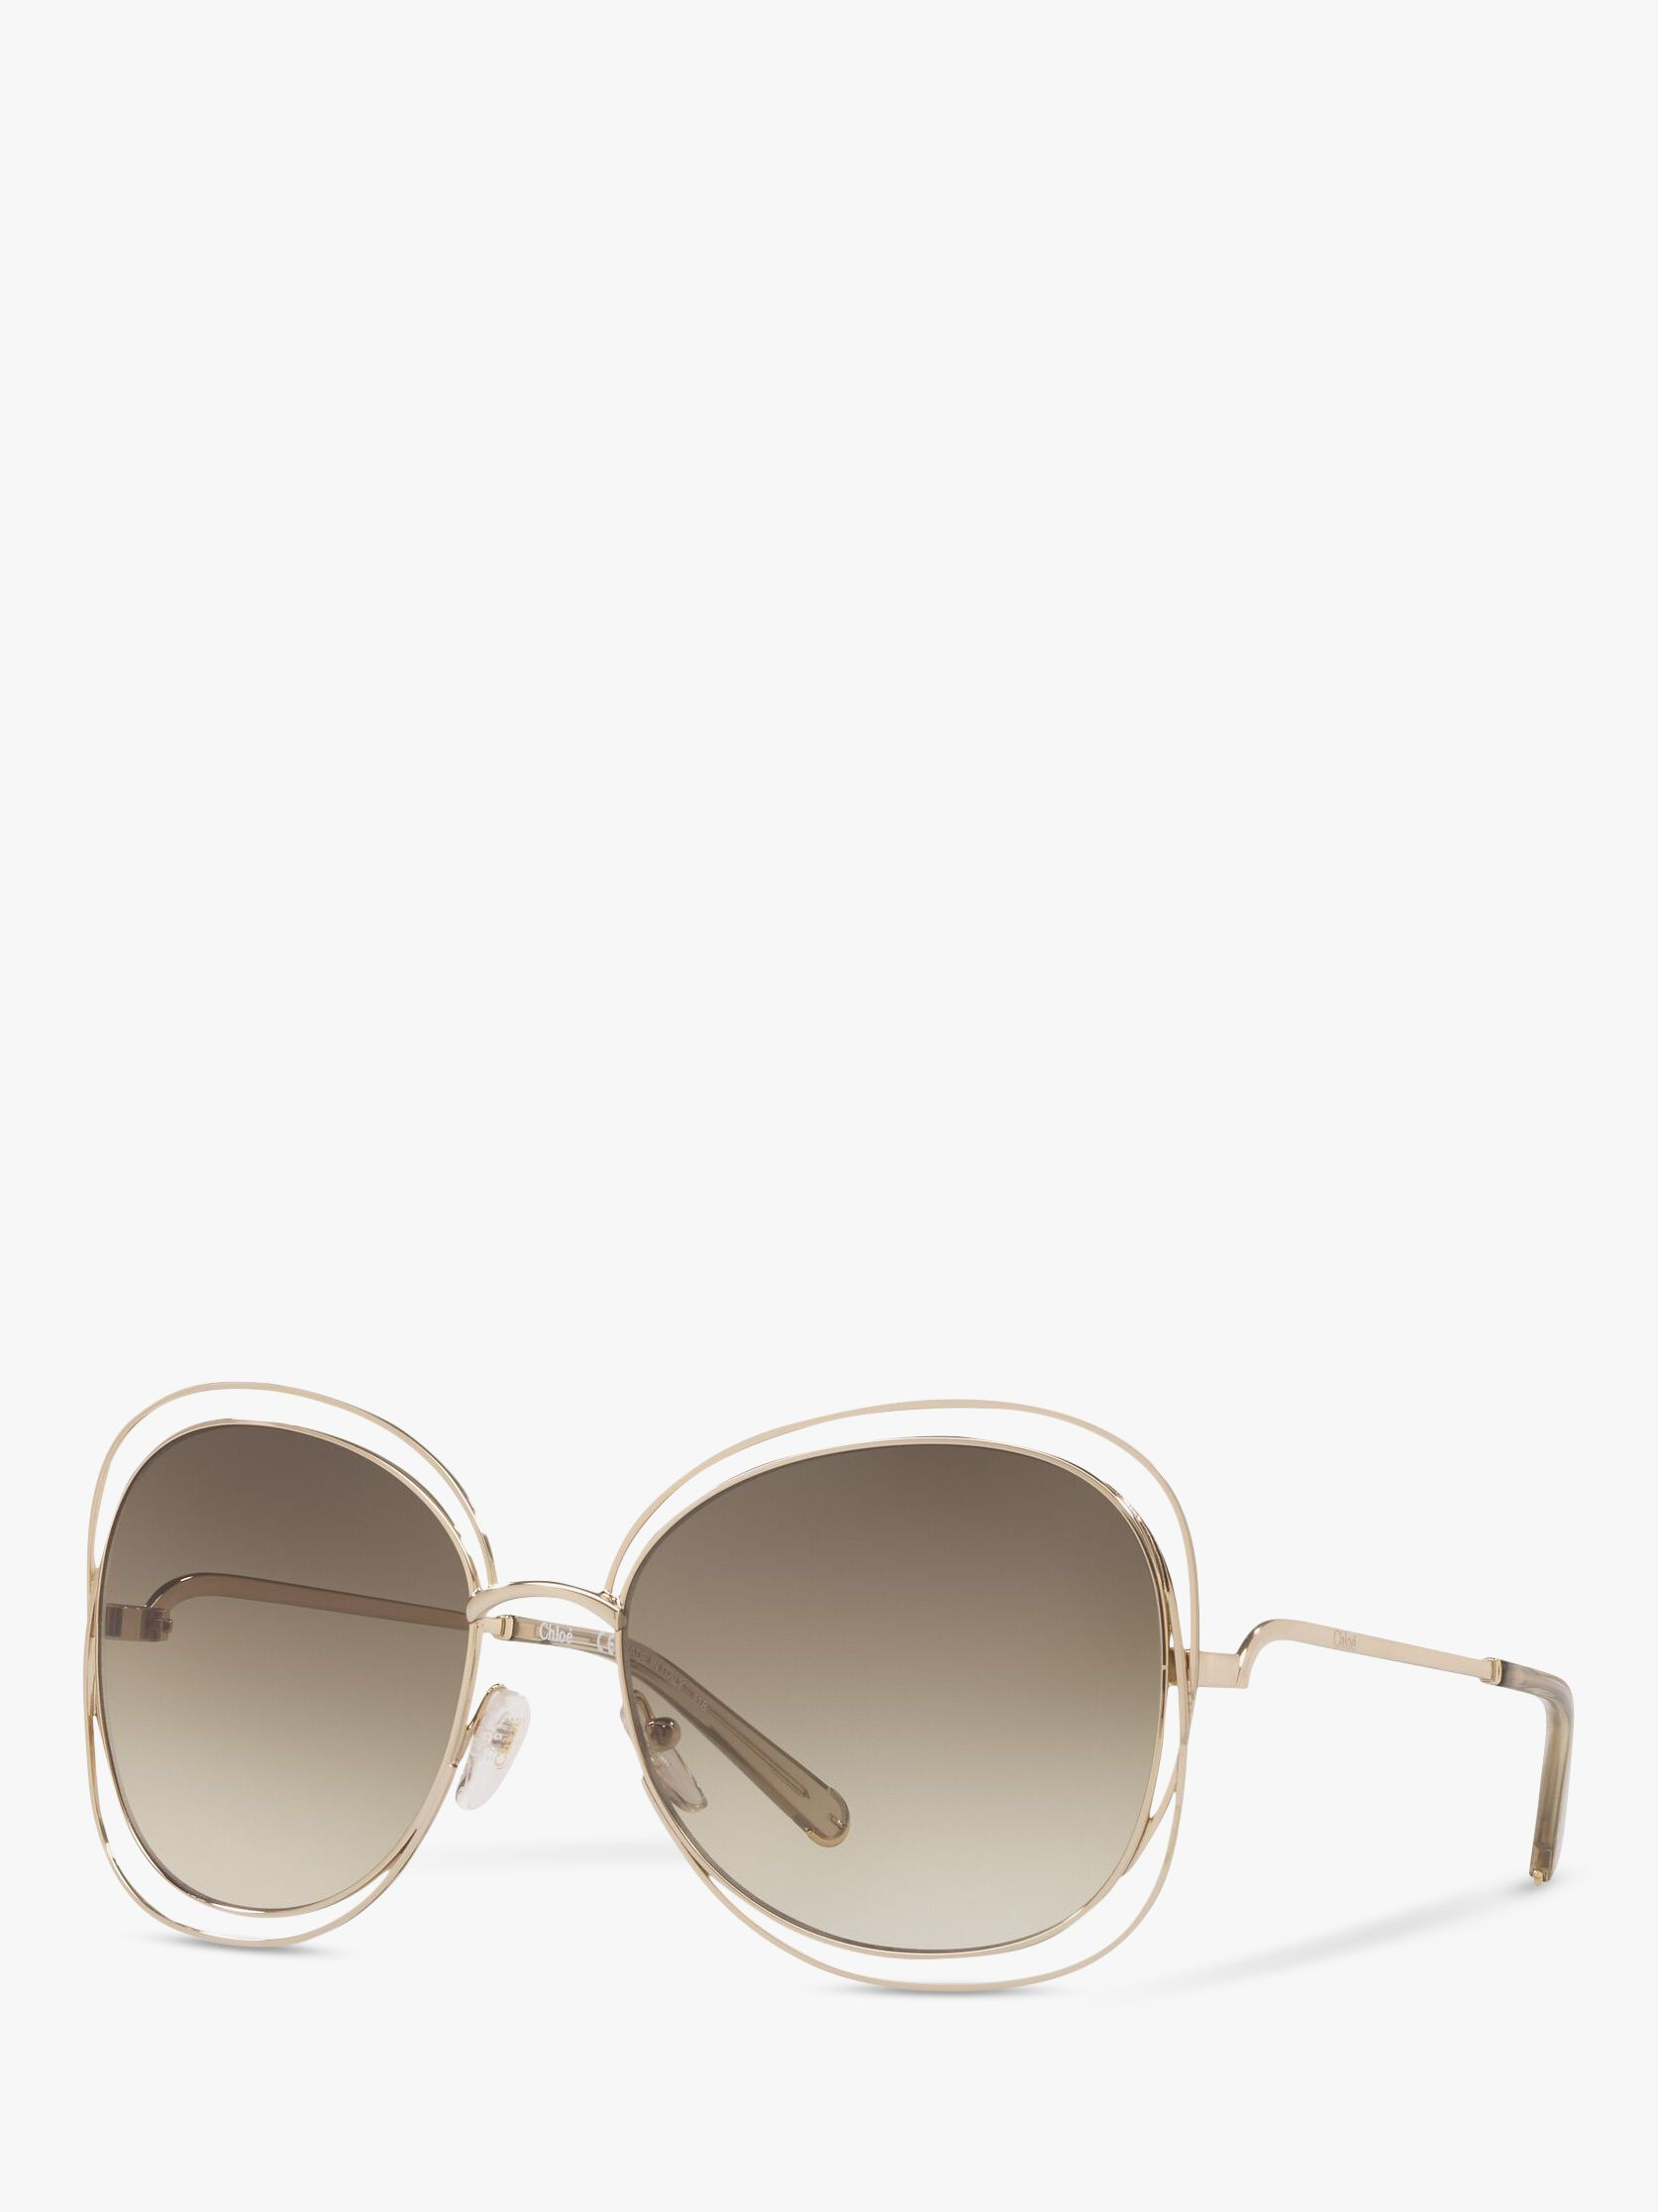 Chloe Chloé 119 Women's Double Rim Aviator Sunglasses, Gold Green